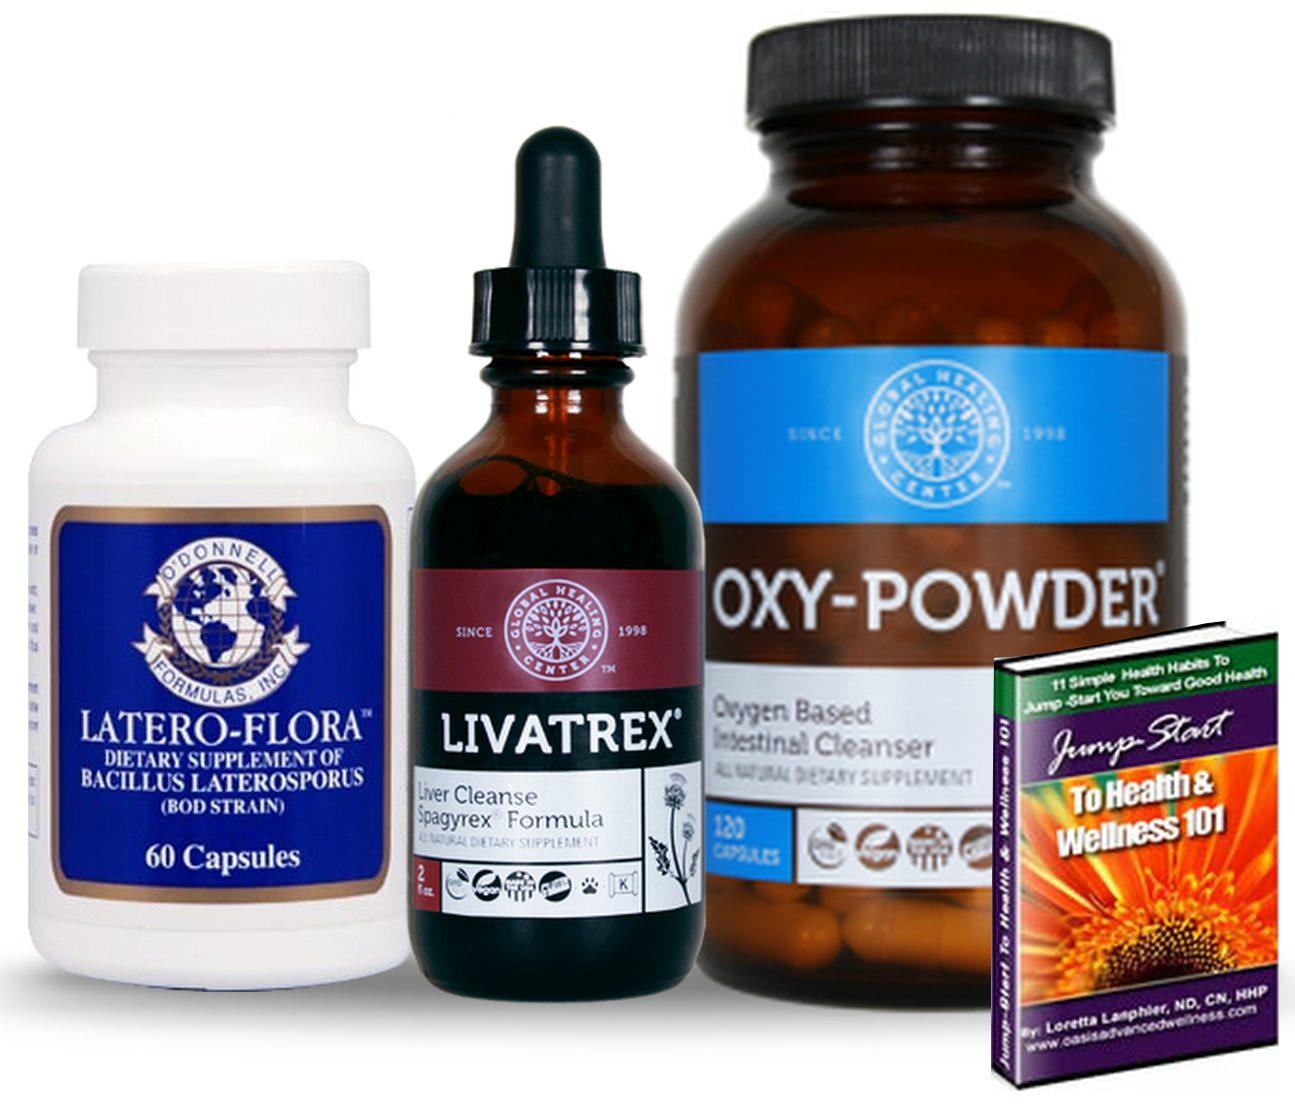 Optimum Wellness Liver Cleanse Kit